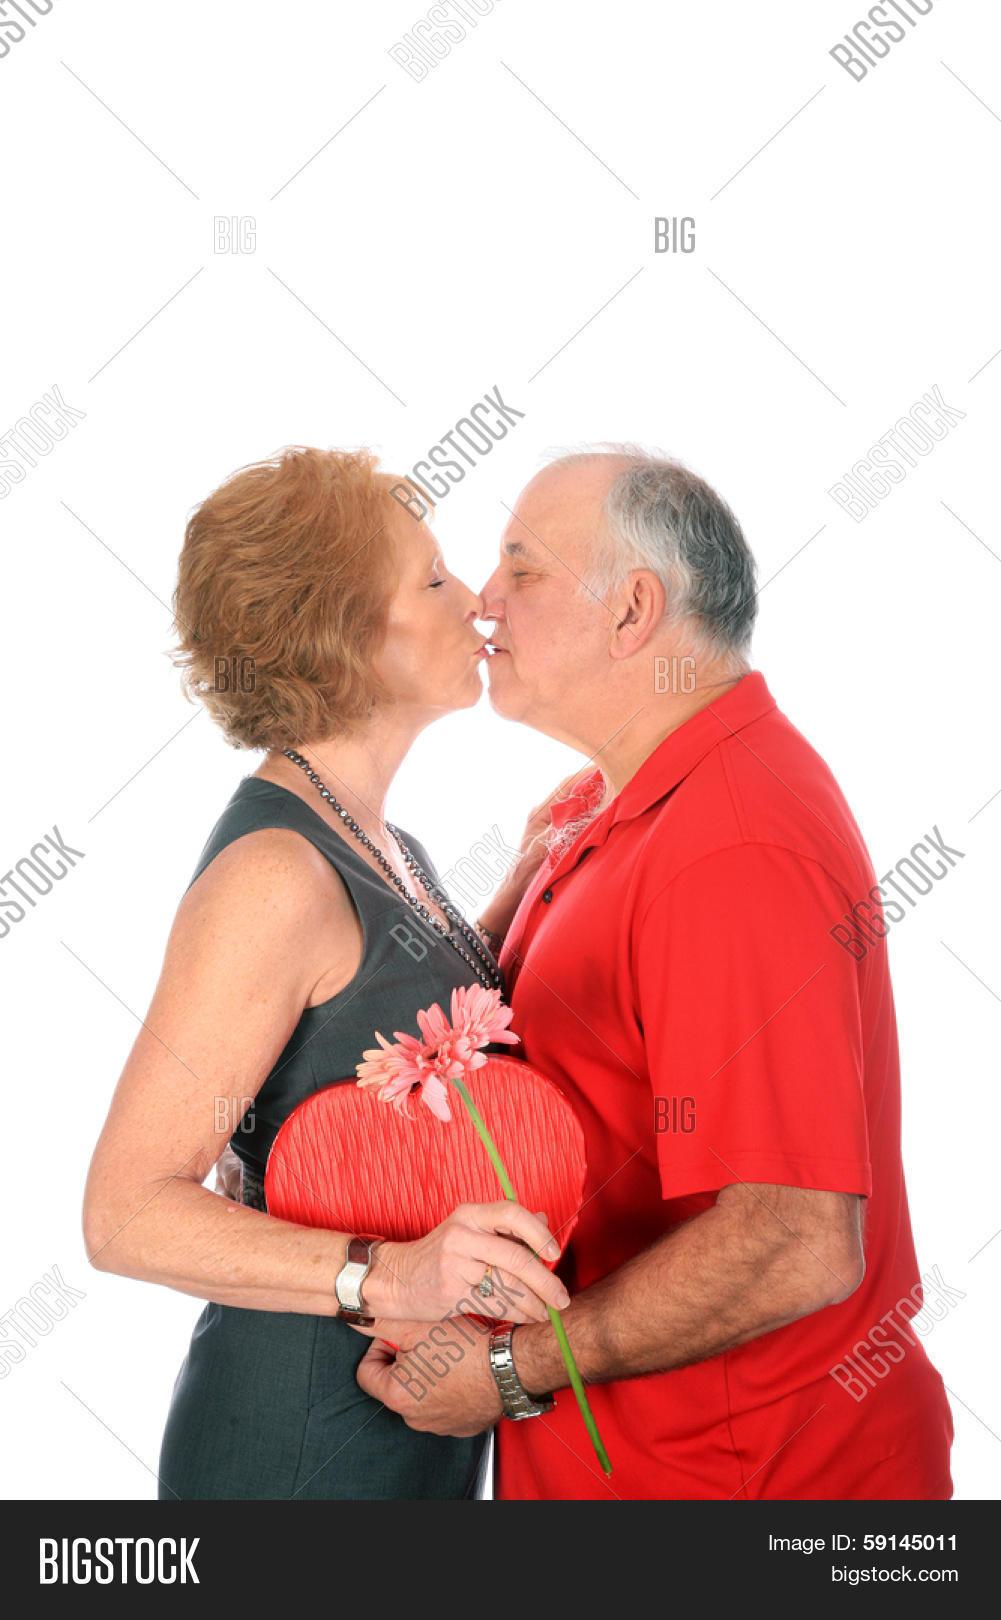 Senior Couple Still Image & Photo (Free Trial) | Bigstock